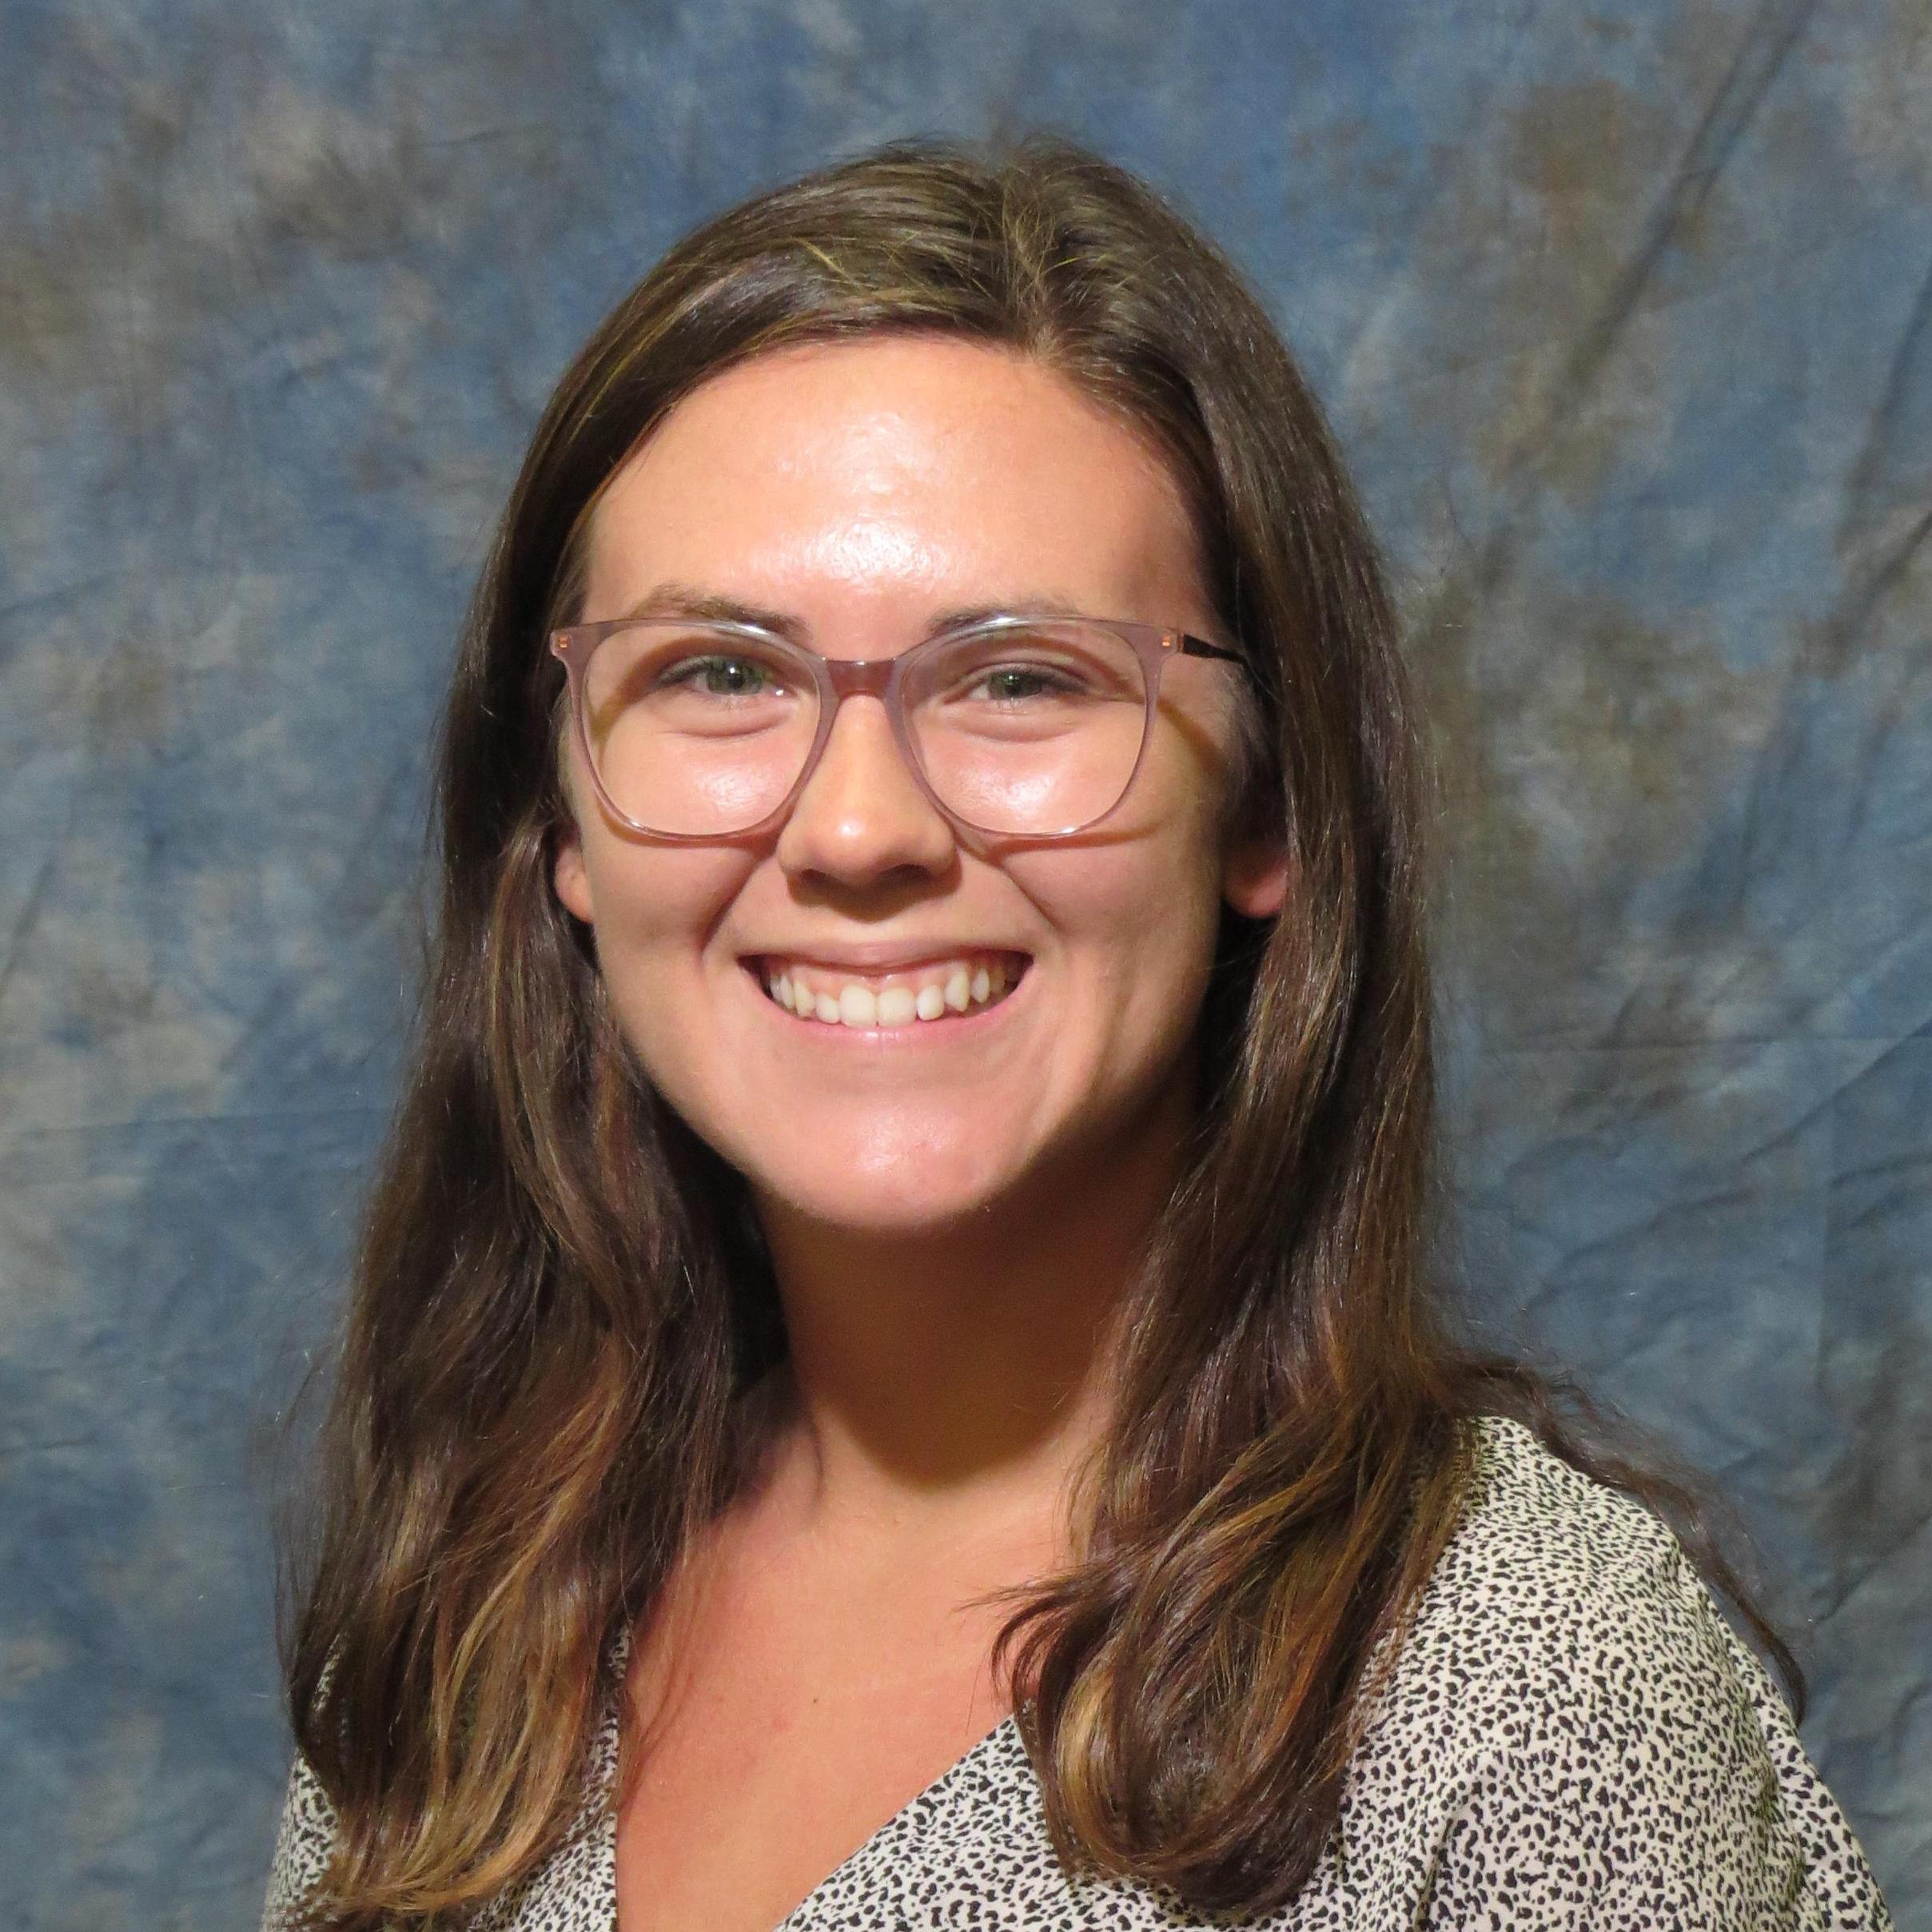 Emalie-Kiersten Anderson's Profile Photo